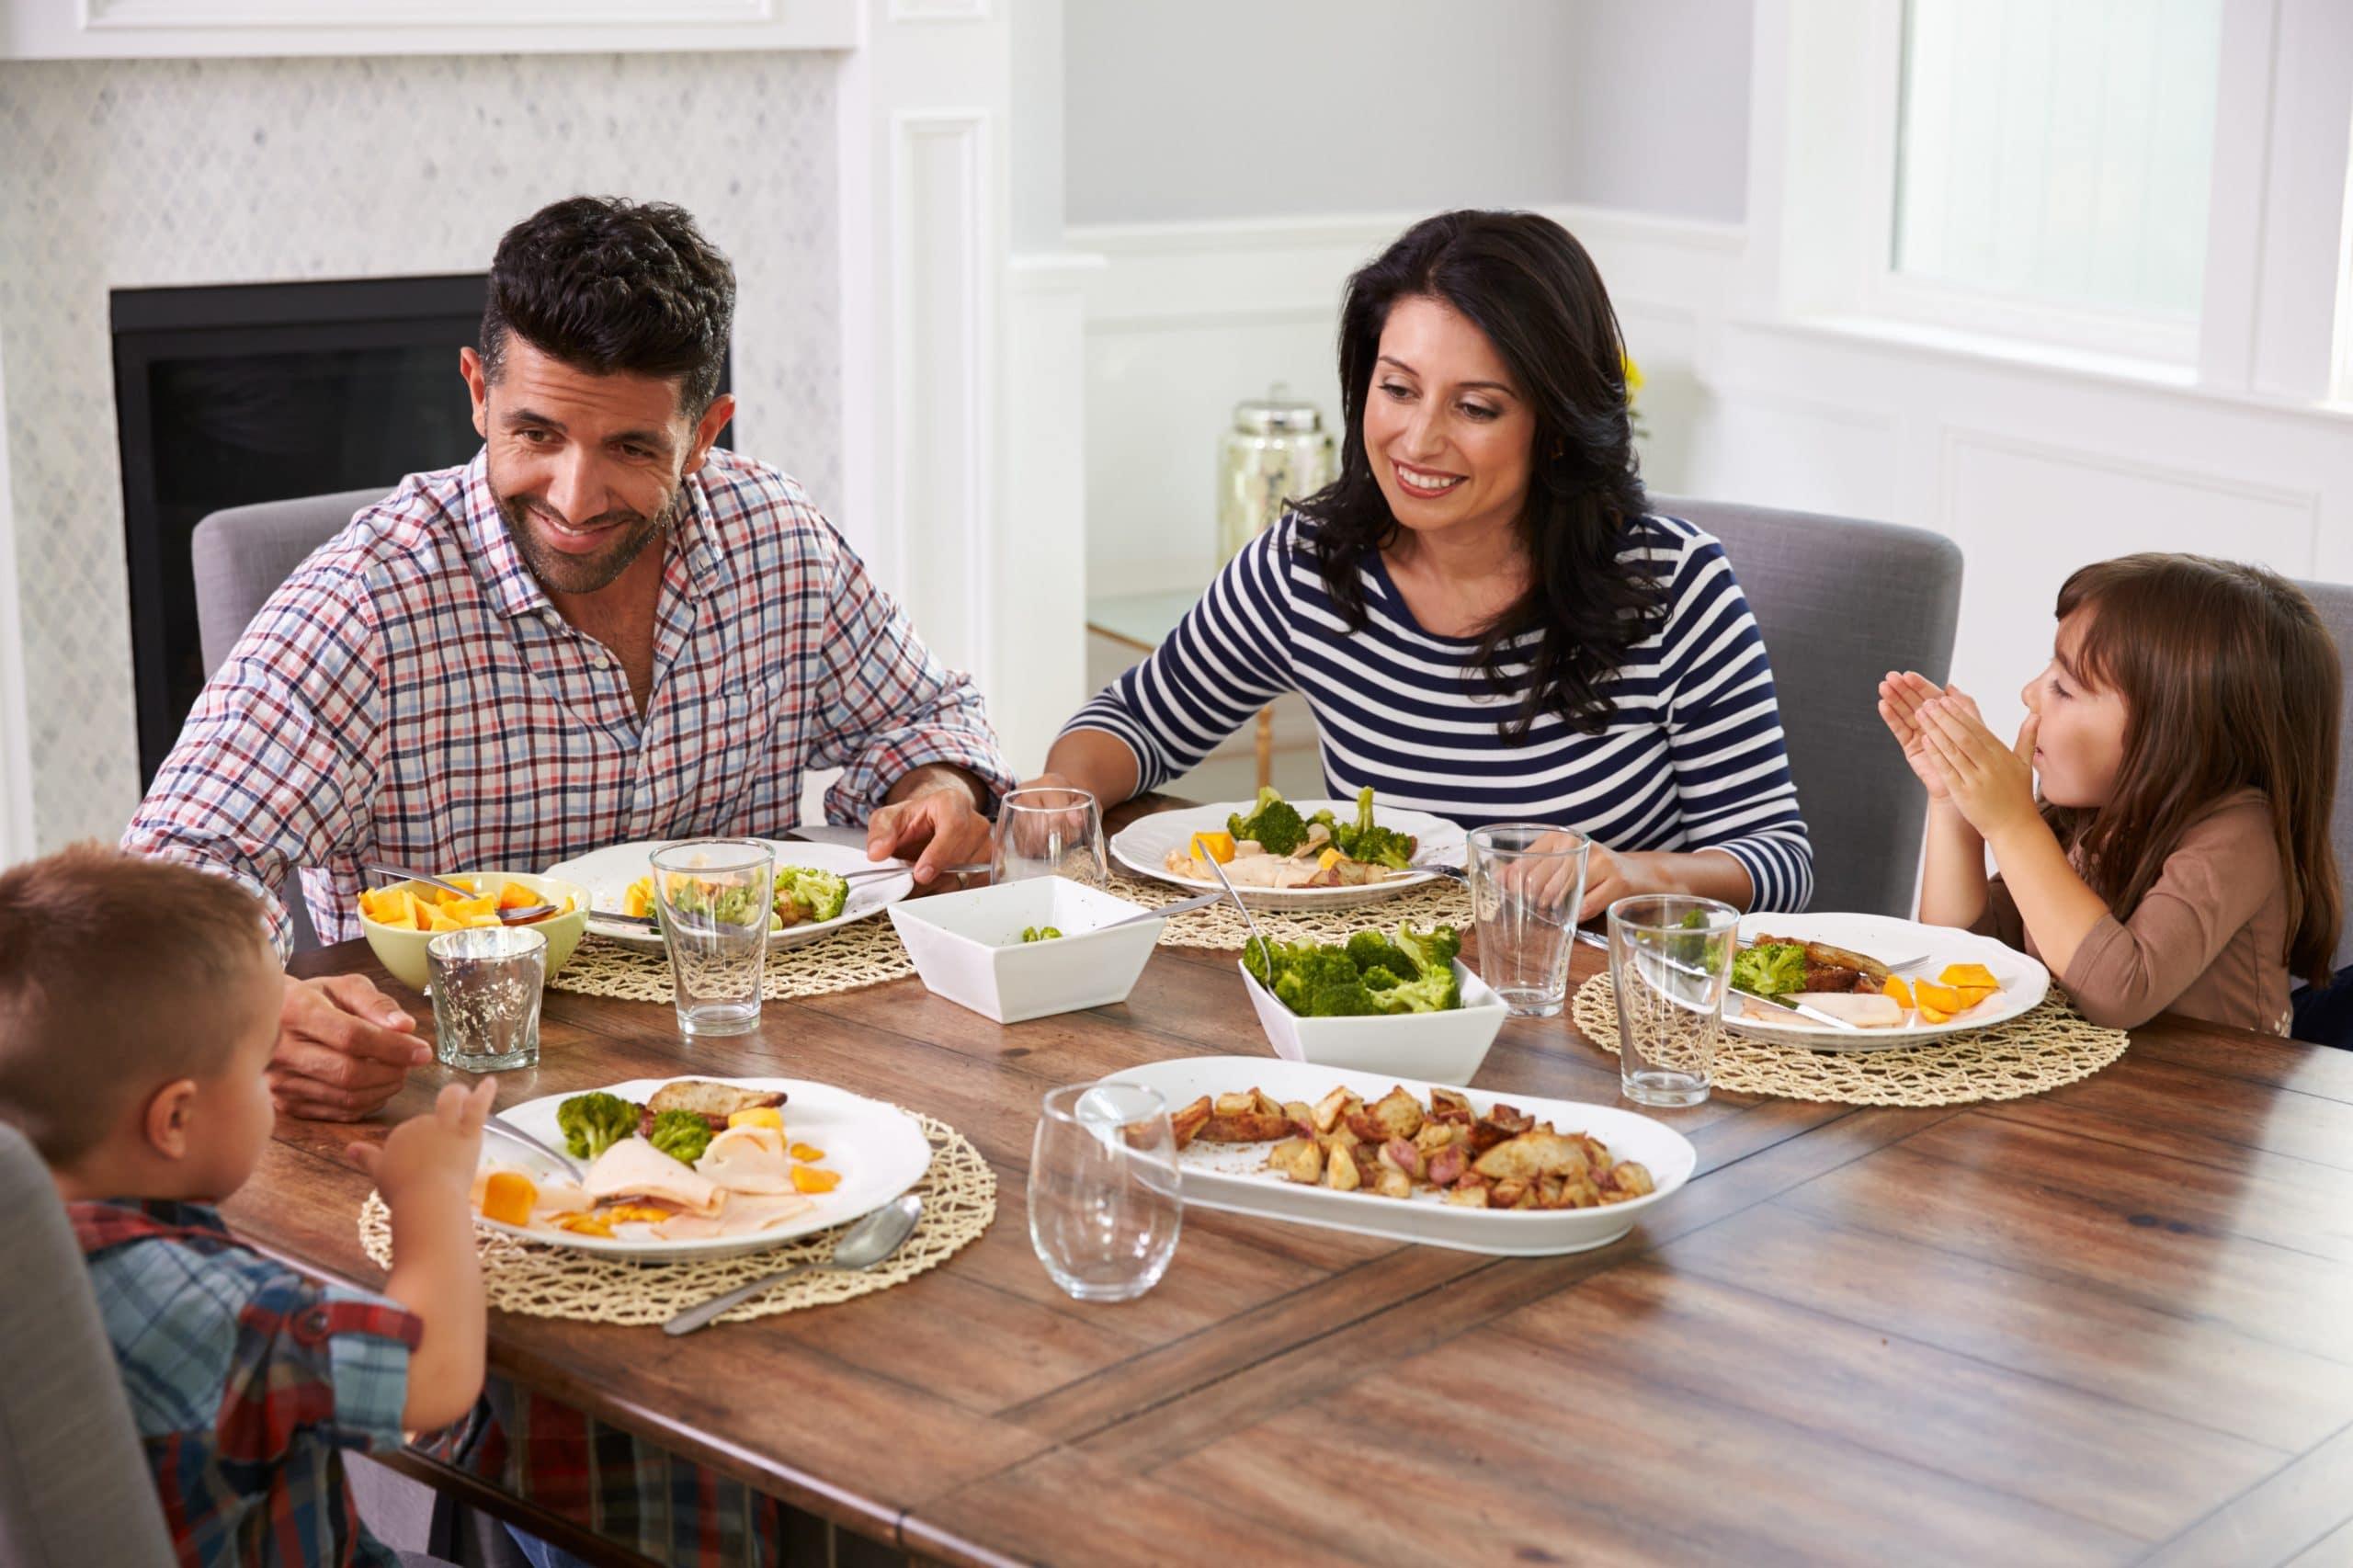 Family of Four Enjoying Dinner Together